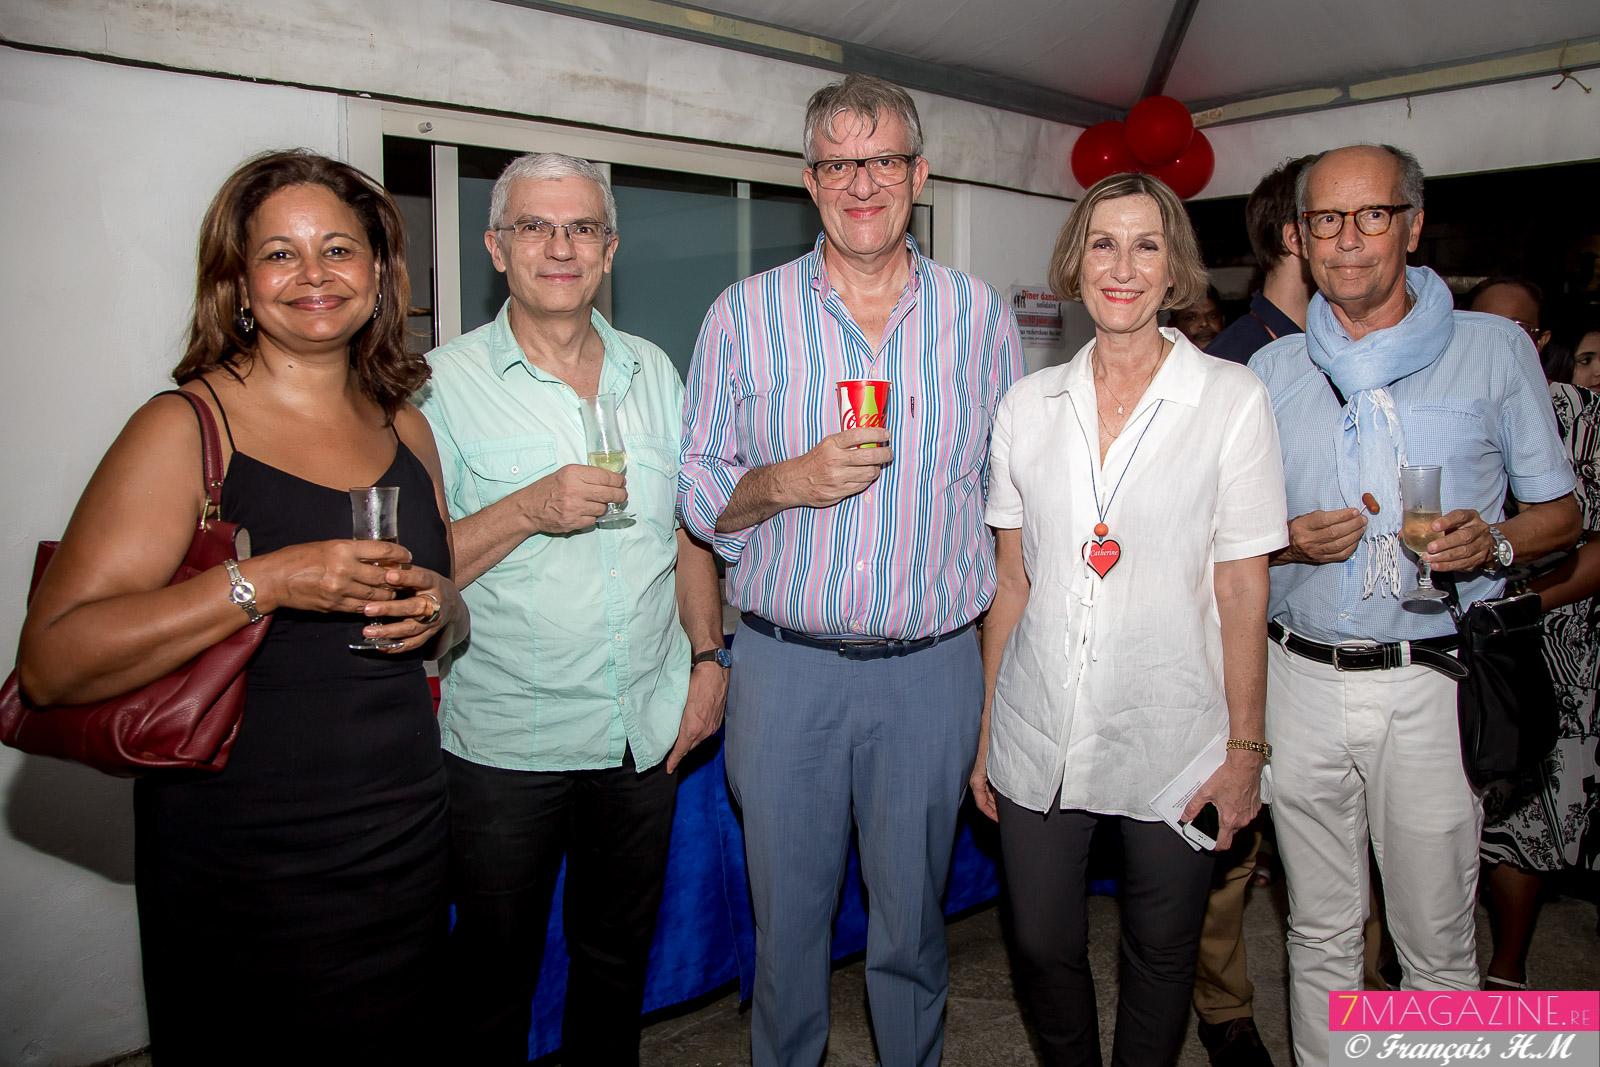 Catherine Gaud avec Claudine et Philippe Lorin et des invités